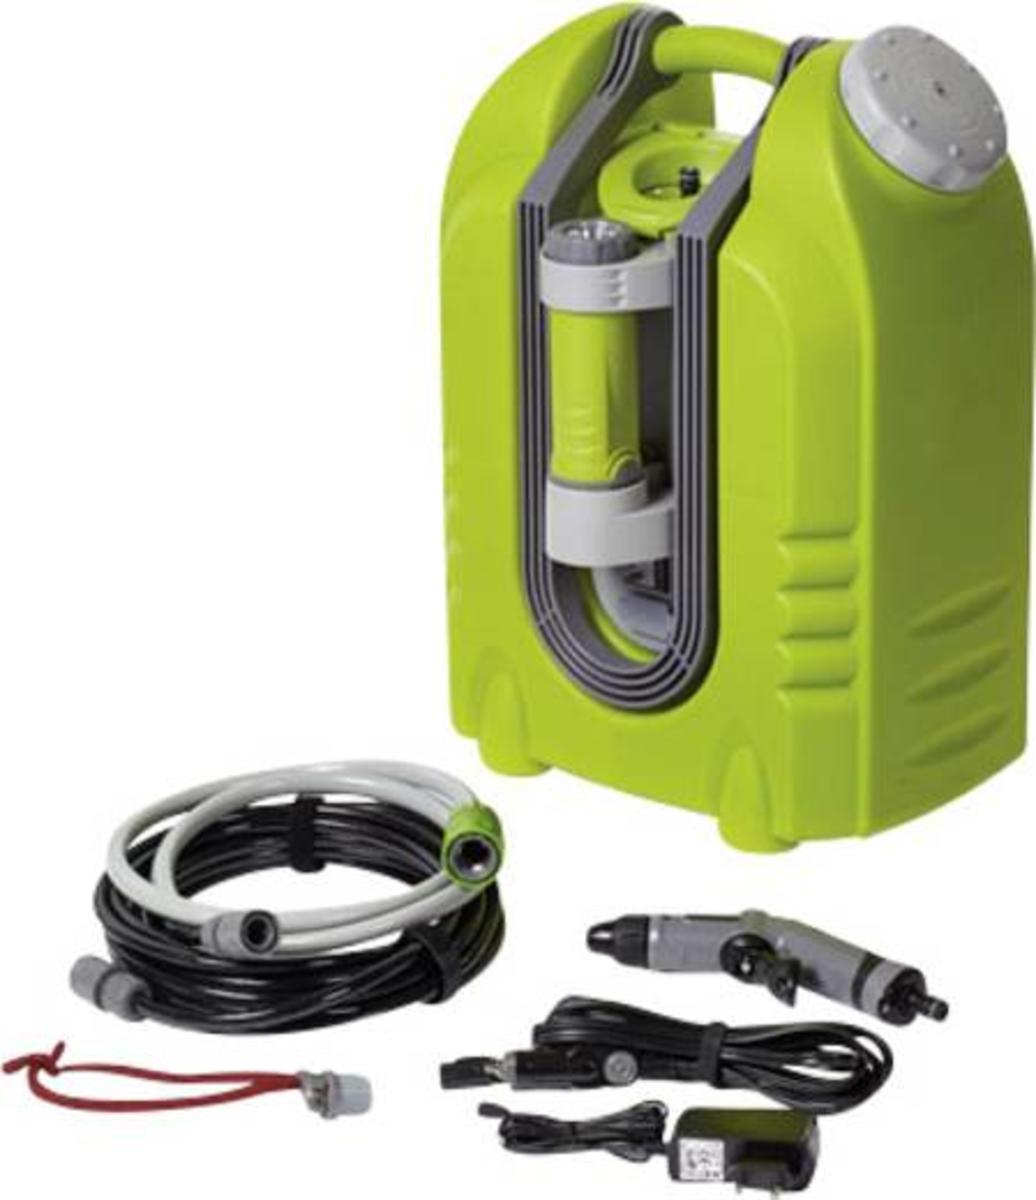 aqua2go pro mobiler hochdruckreiniger 10 bar 230 v kaltwasser 90 l/h